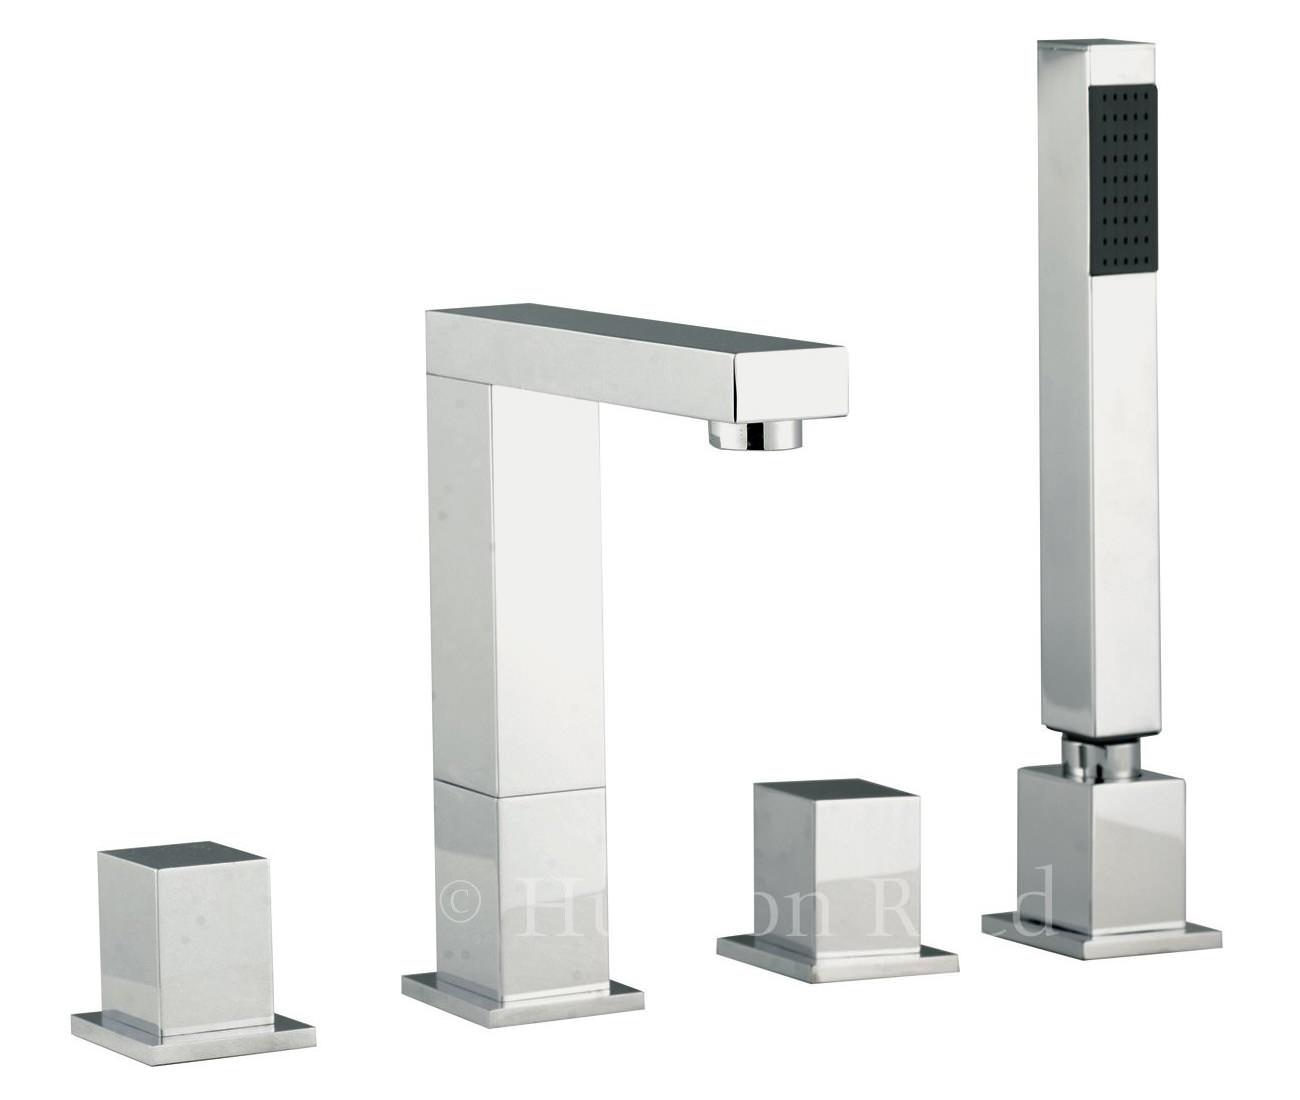 hudson reed kubix 4 tap hole bath mixer tap with shower kit. Black Bedroom Furniture Sets. Home Design Ideas